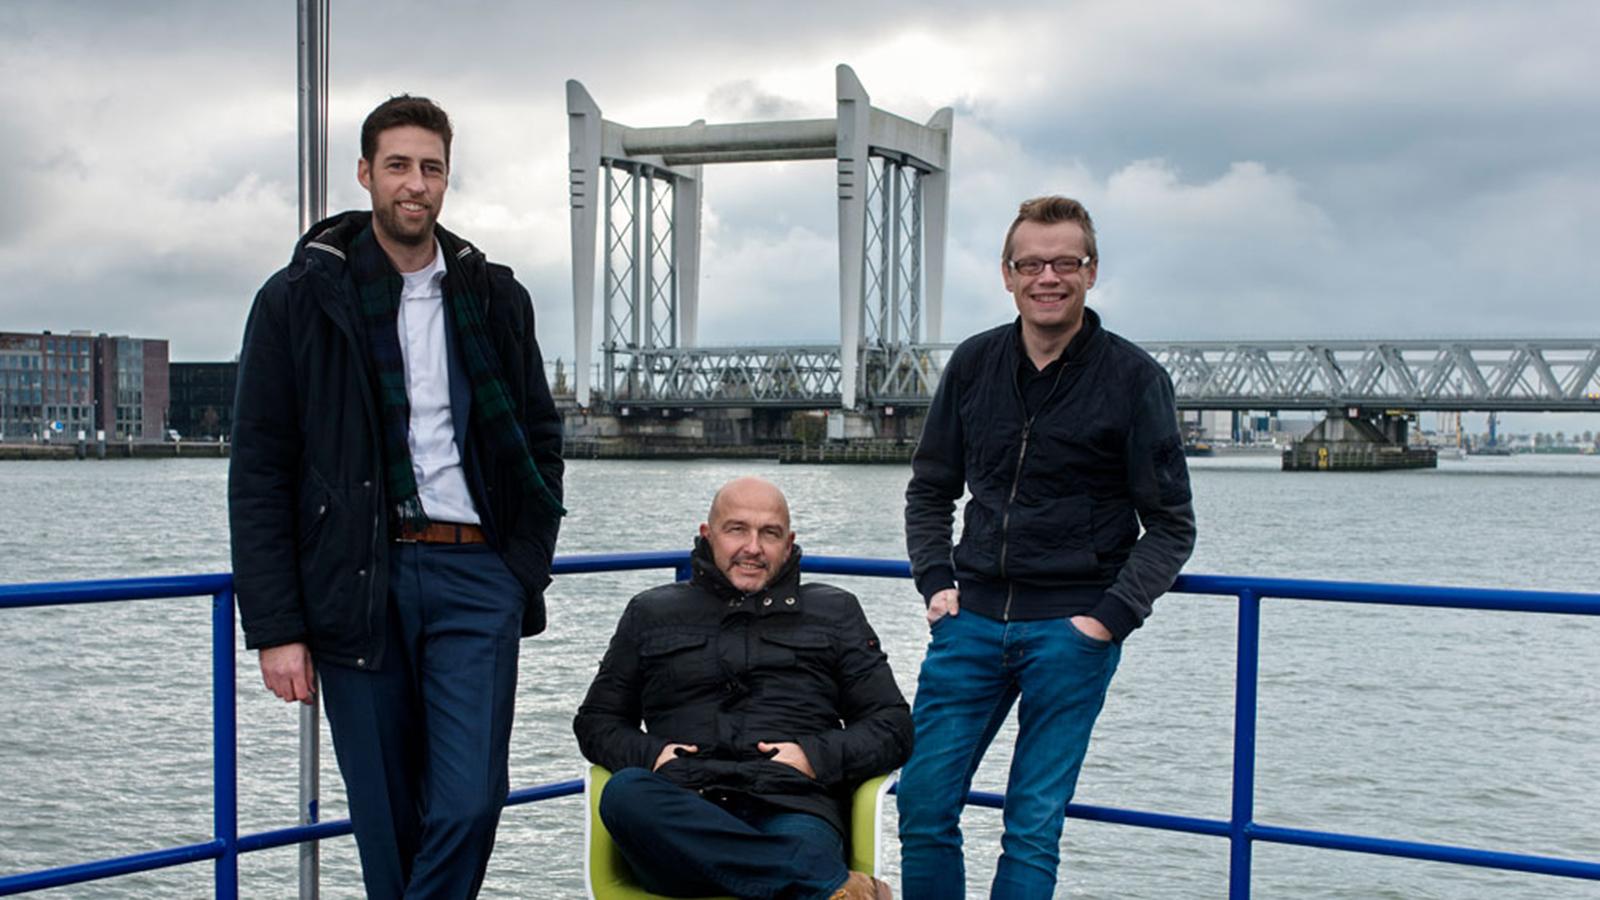 MKB-katalysatorfonds - Innovation Quarter - Drechtsteden -1600x900px-slider